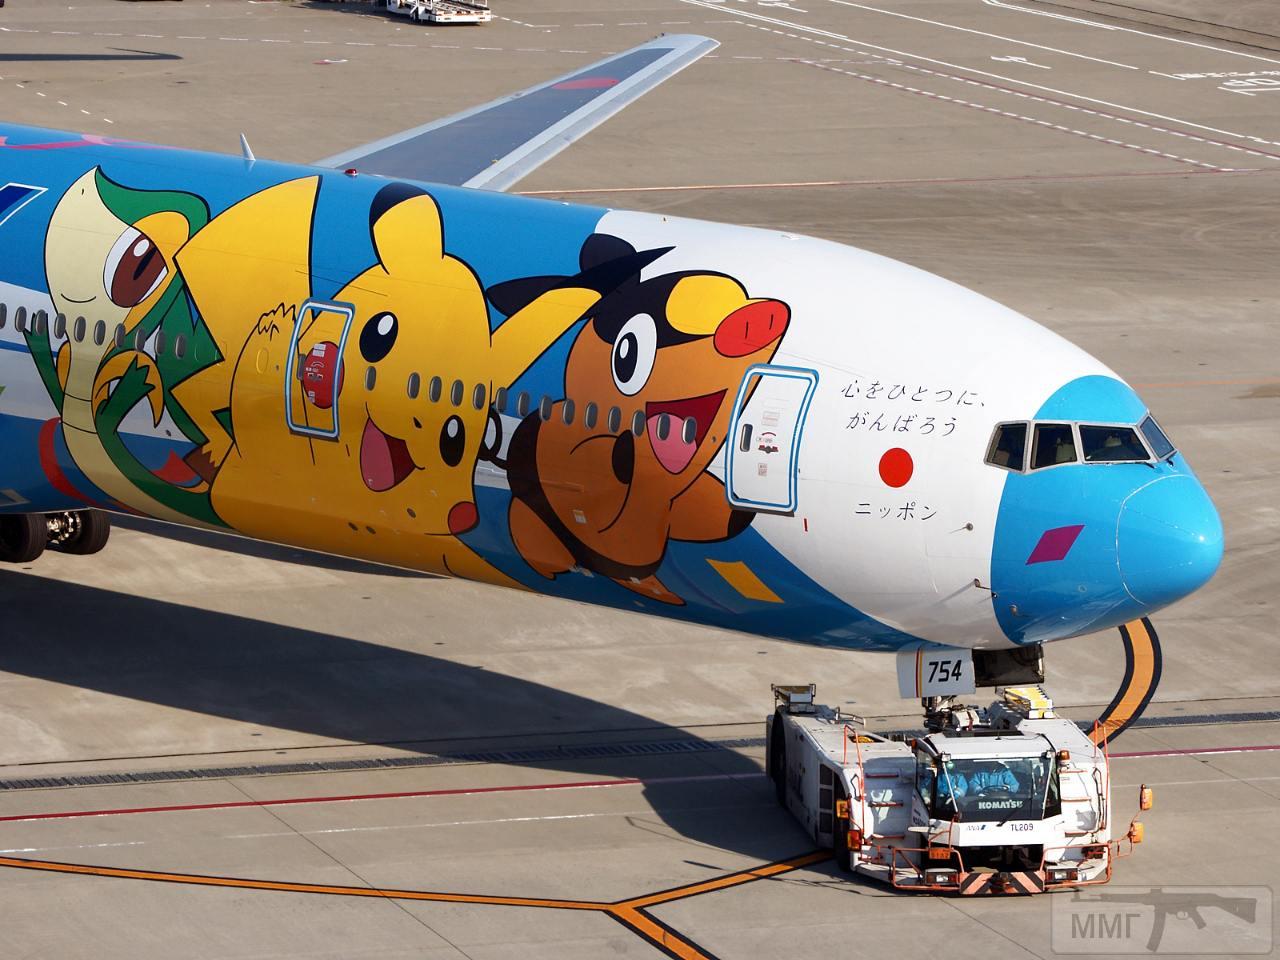 21002 - Первым делом, первым делом самолеты...